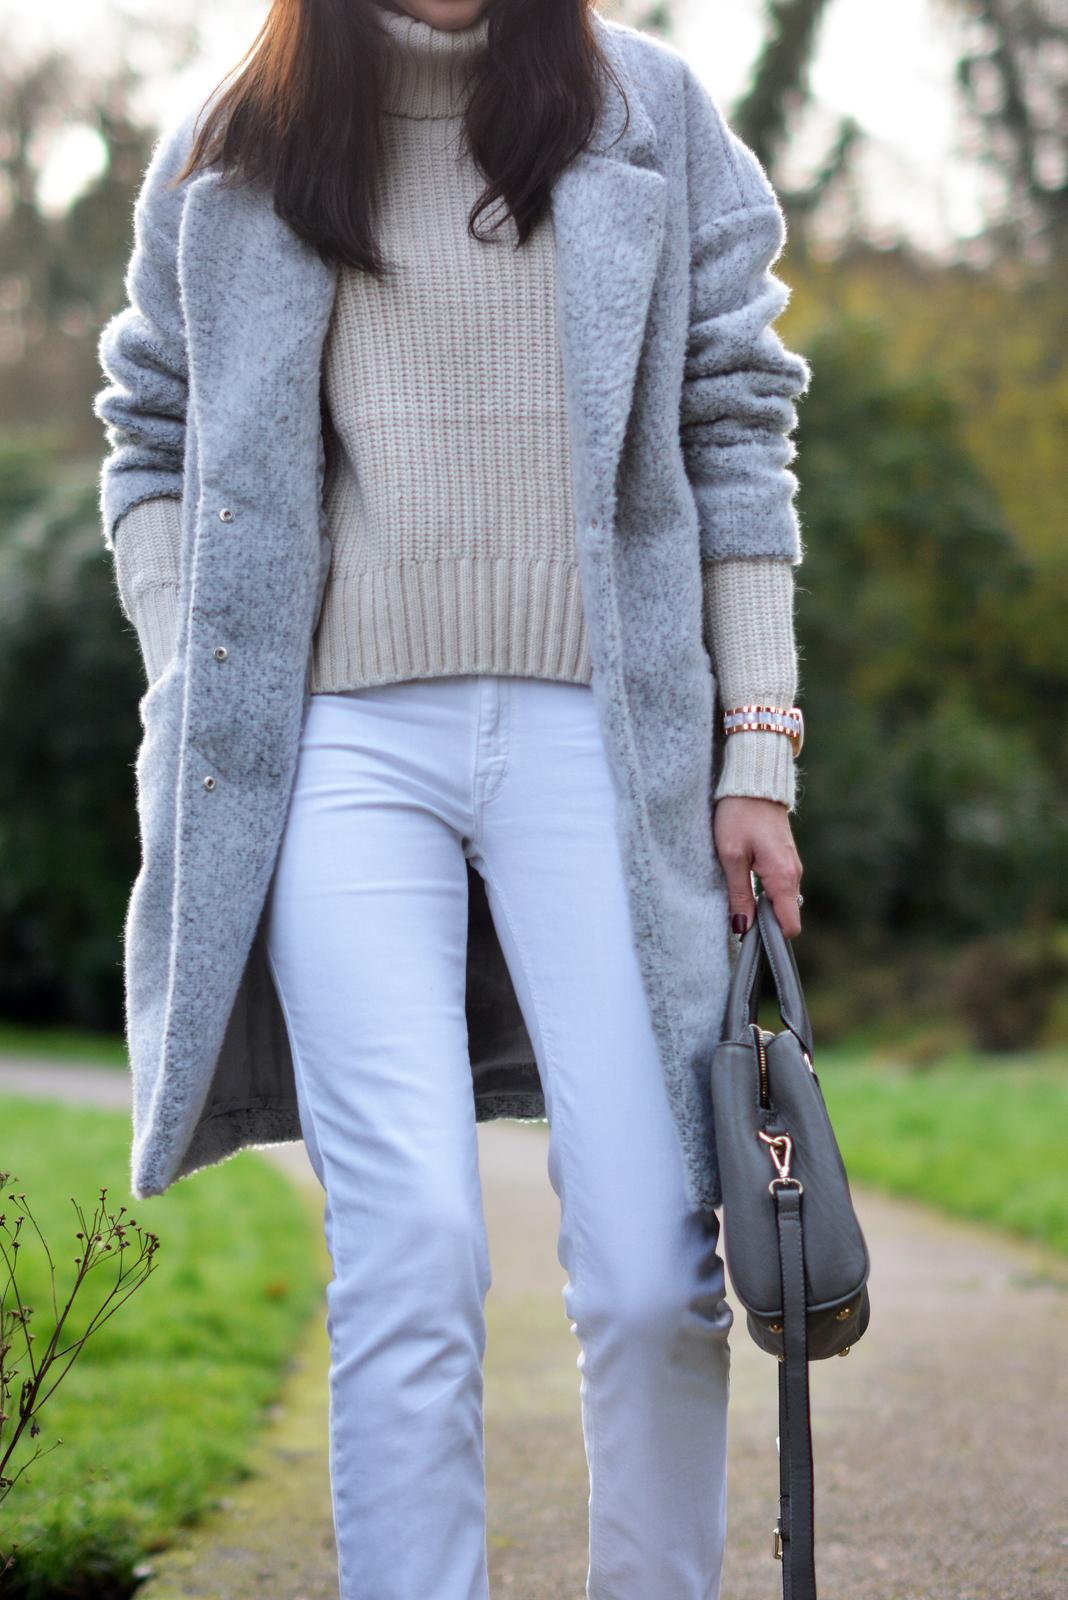 EJSTYLE - winter whites OOTD, white jeans, grey primark coat, Grey Zara city bag, Cream topshop jumper sweater roll neck